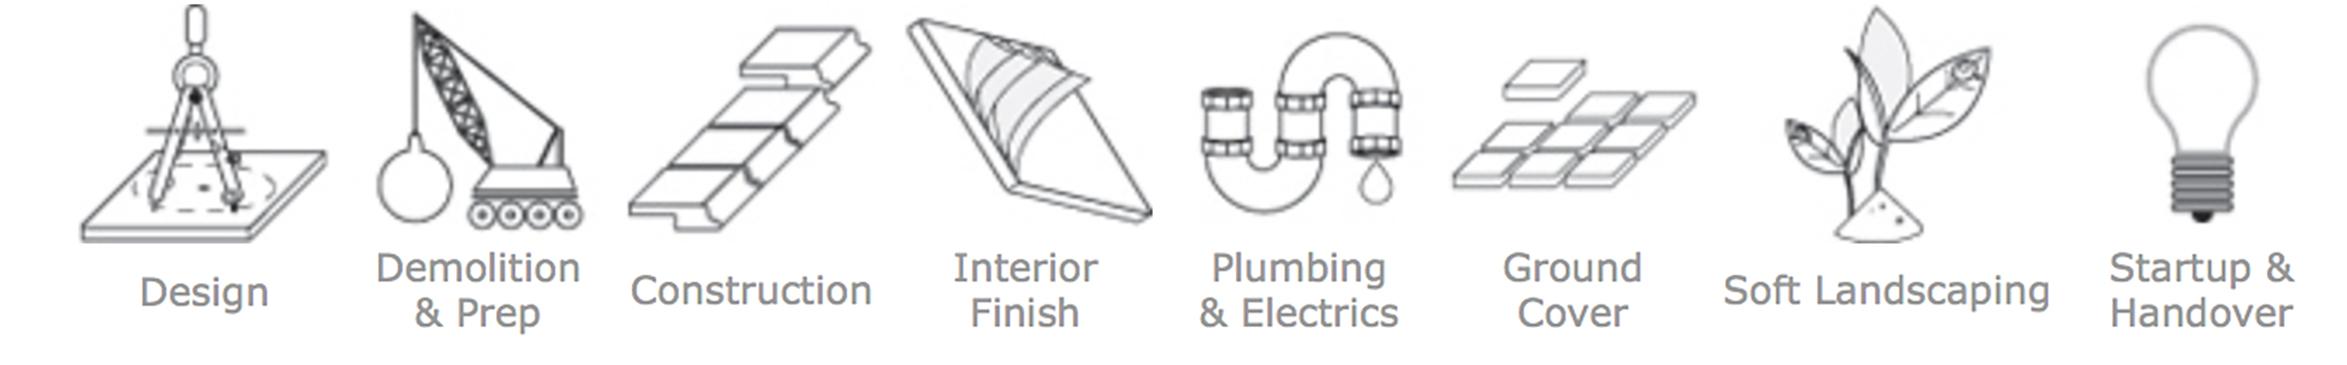 Swimming pool design, construction, renovation, resurfacing and fibreglass coatings Perth